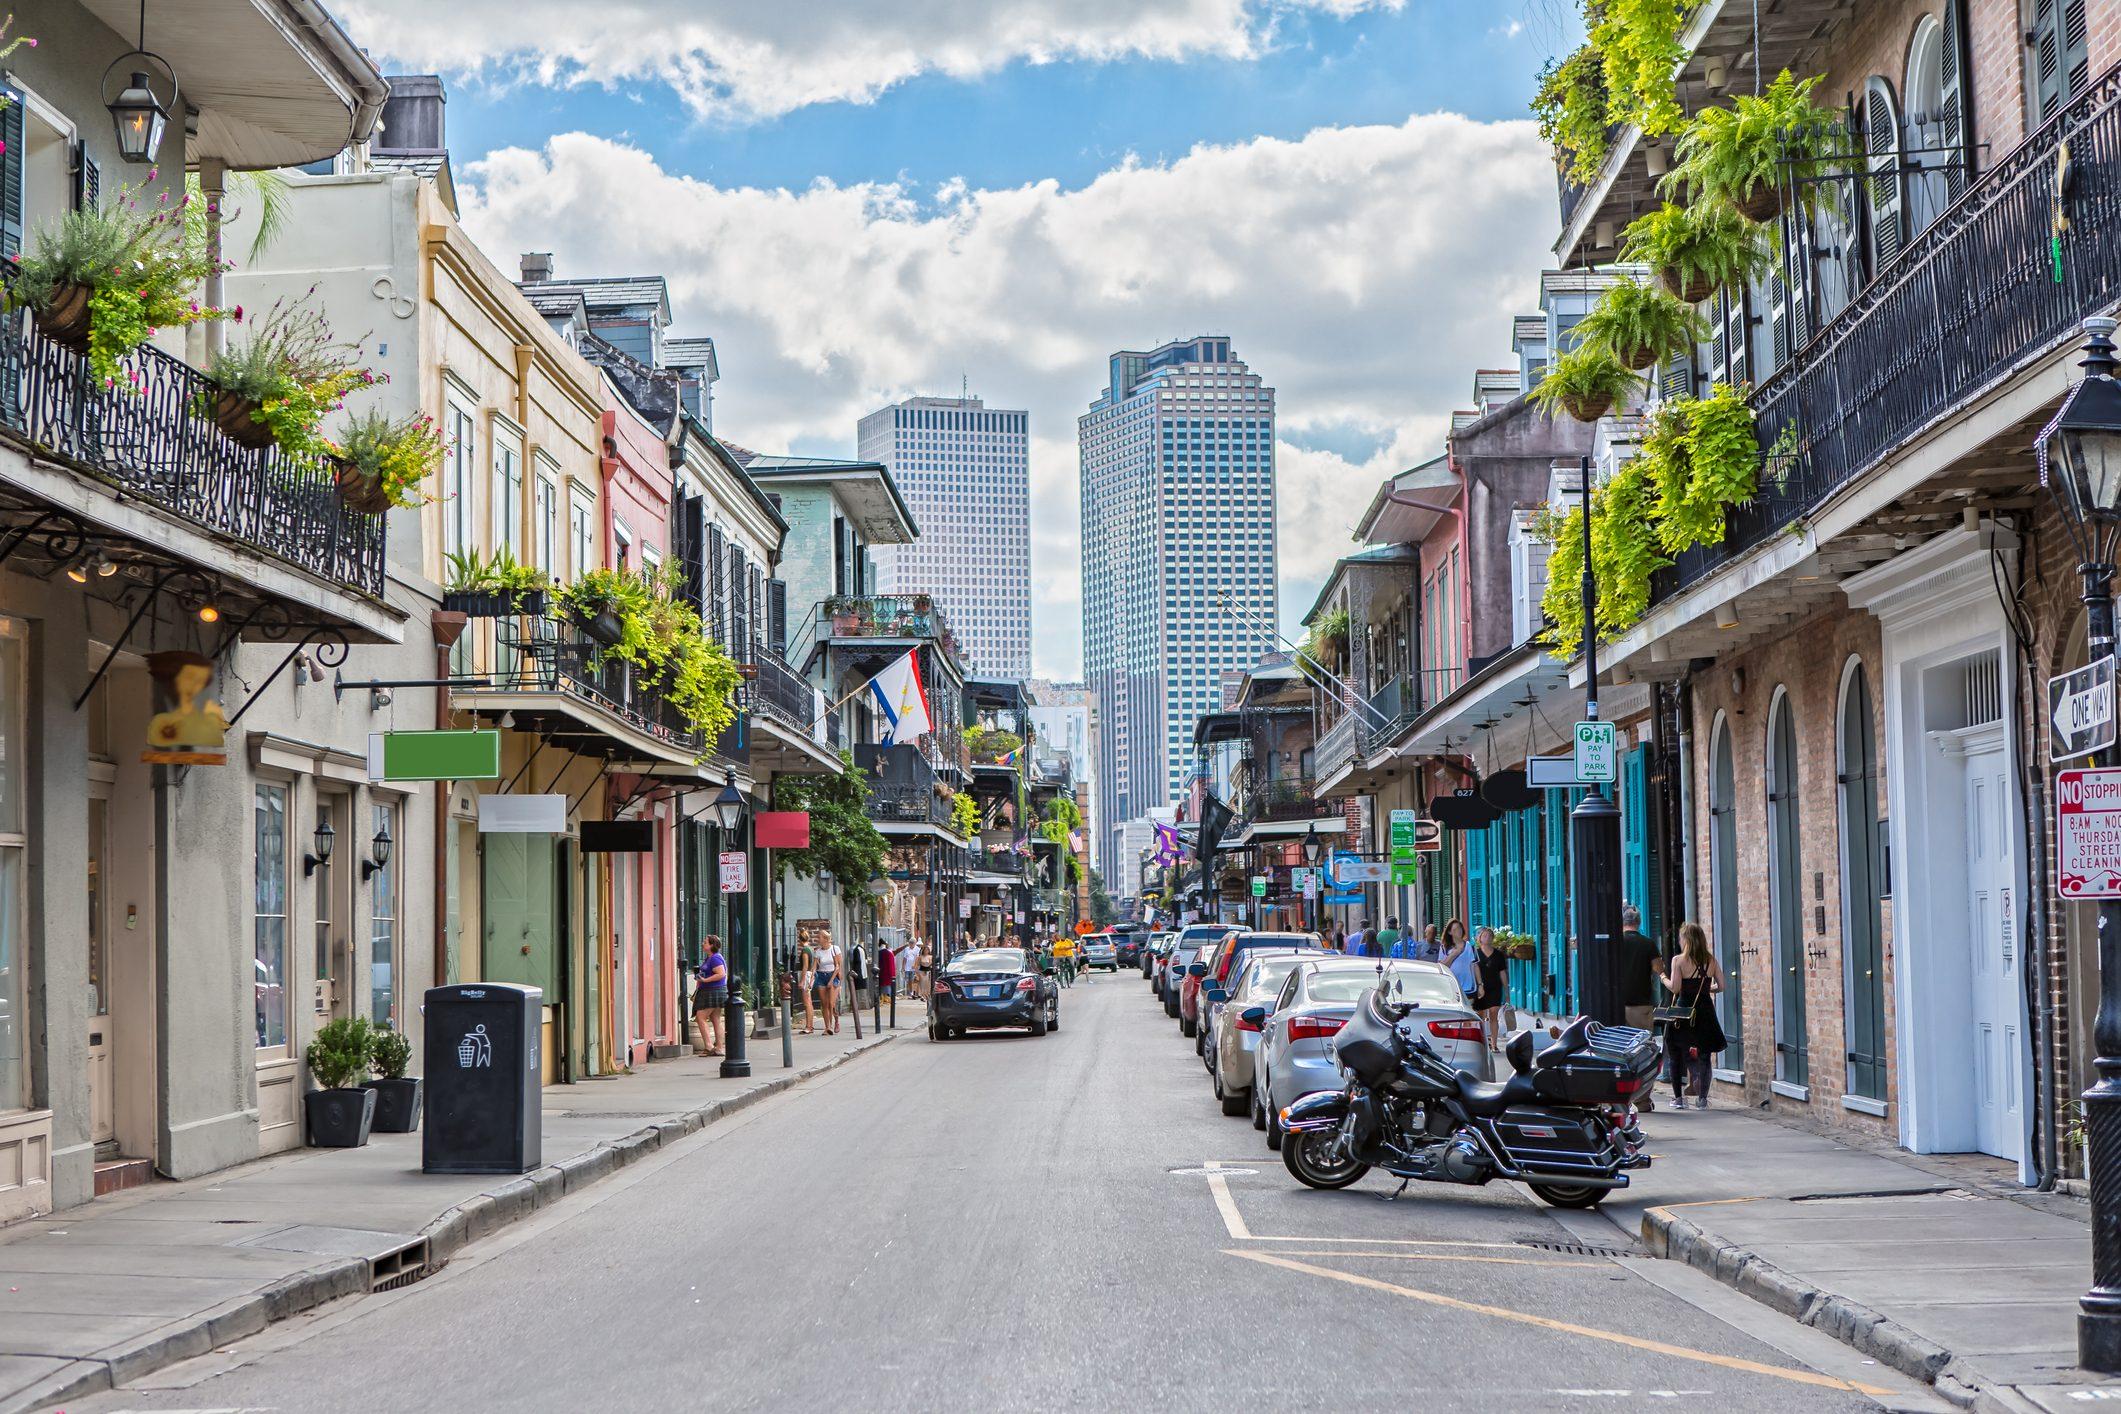 Royal Street in New Orleans, LA